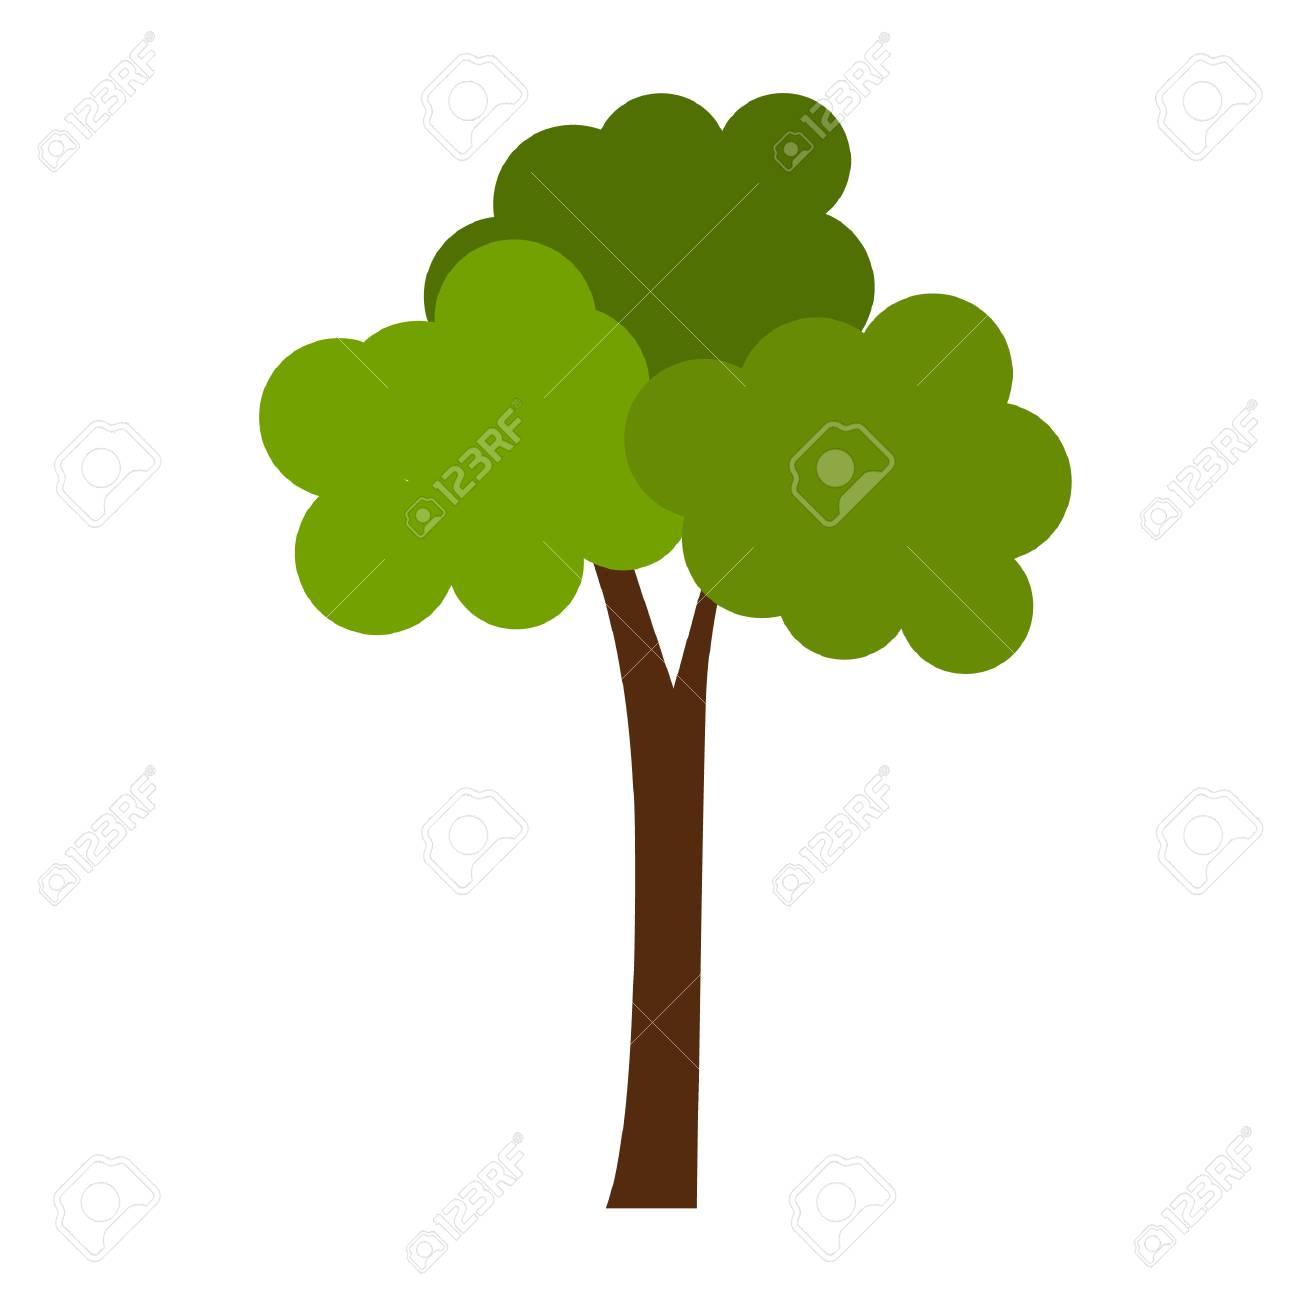 Simple Flat Color Tree Icon Vector Royalty Free Cliparts, Vectors ...